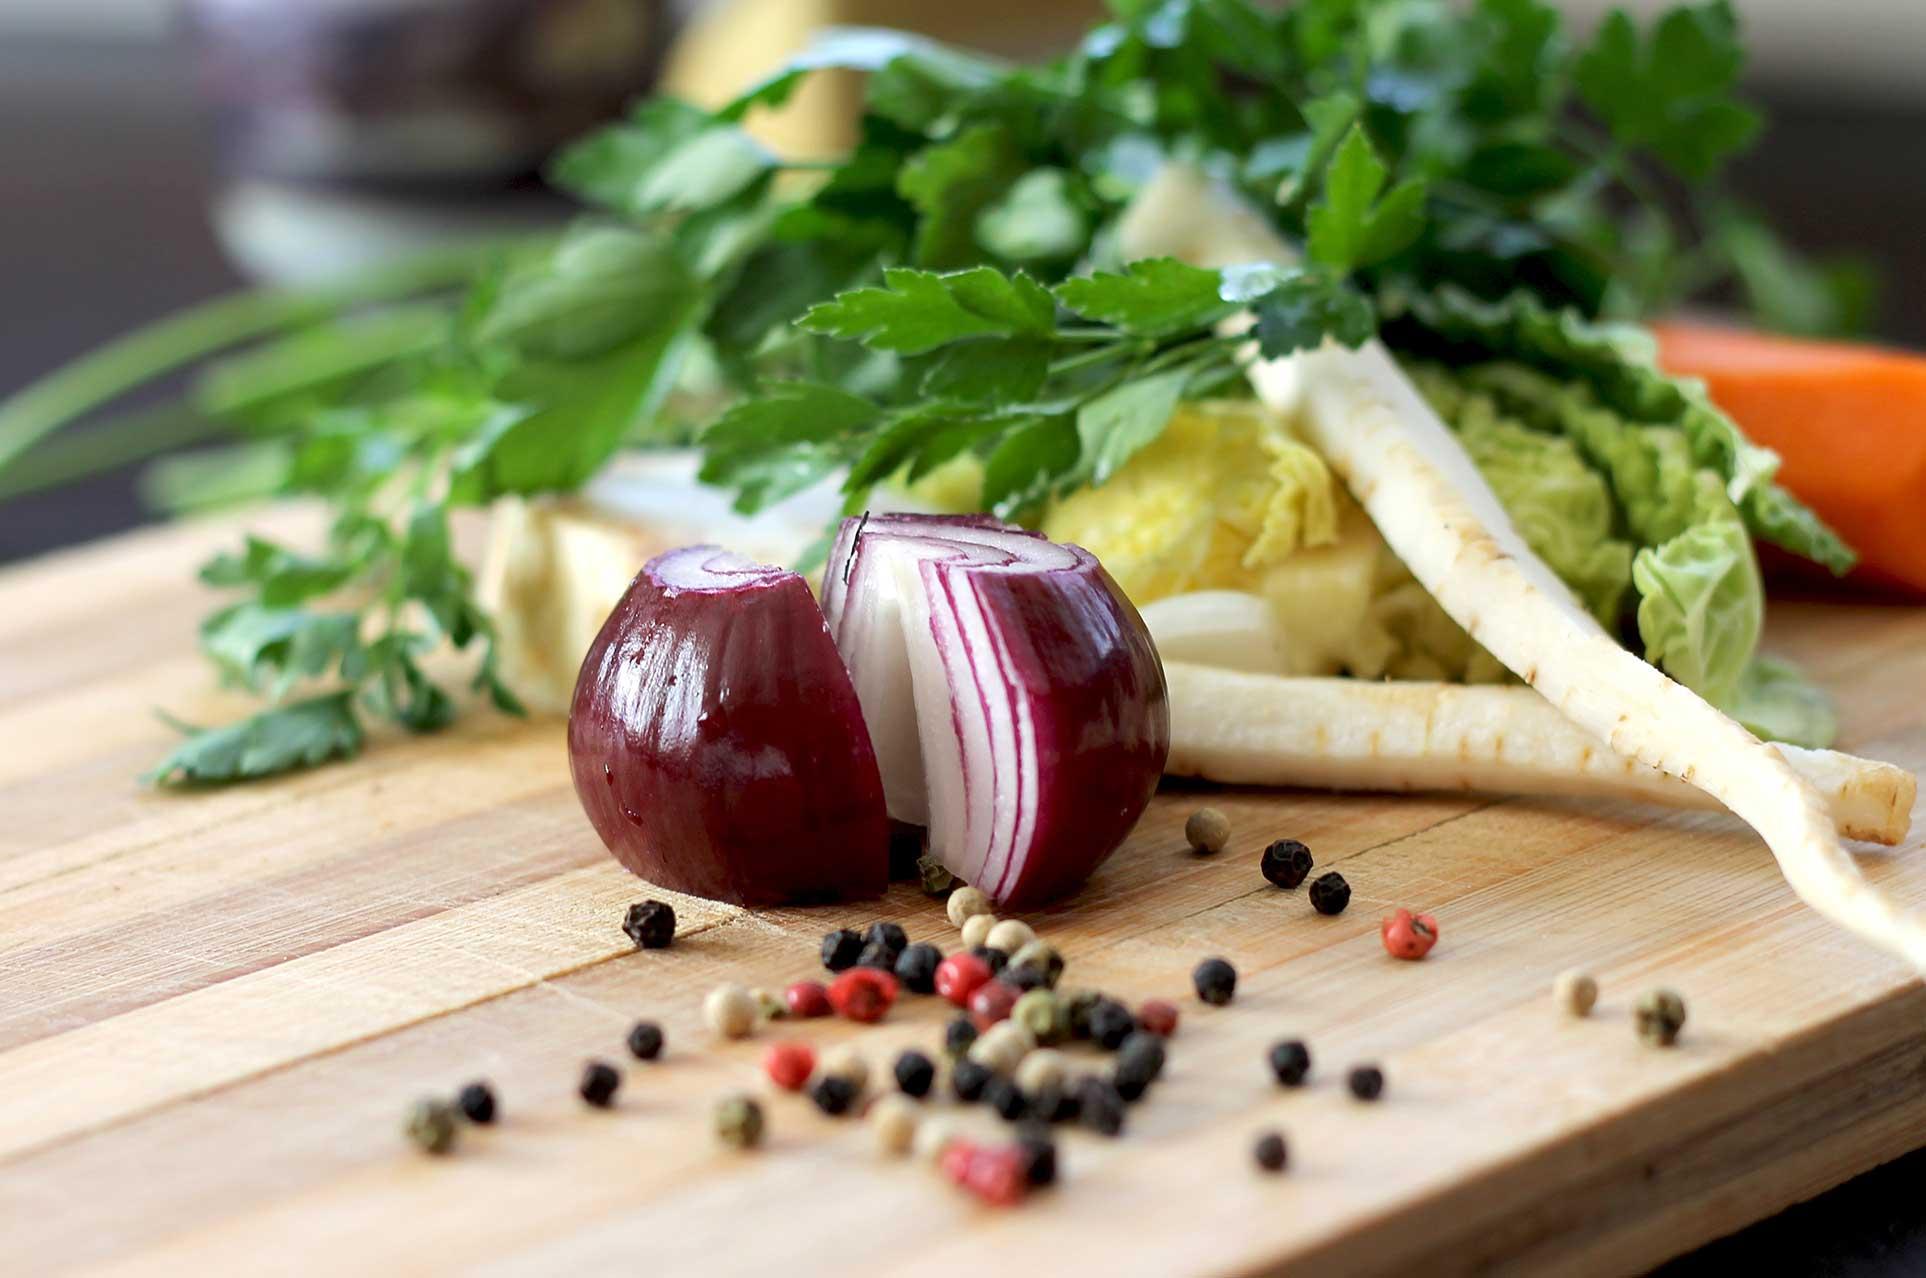 ushqimi bio morali